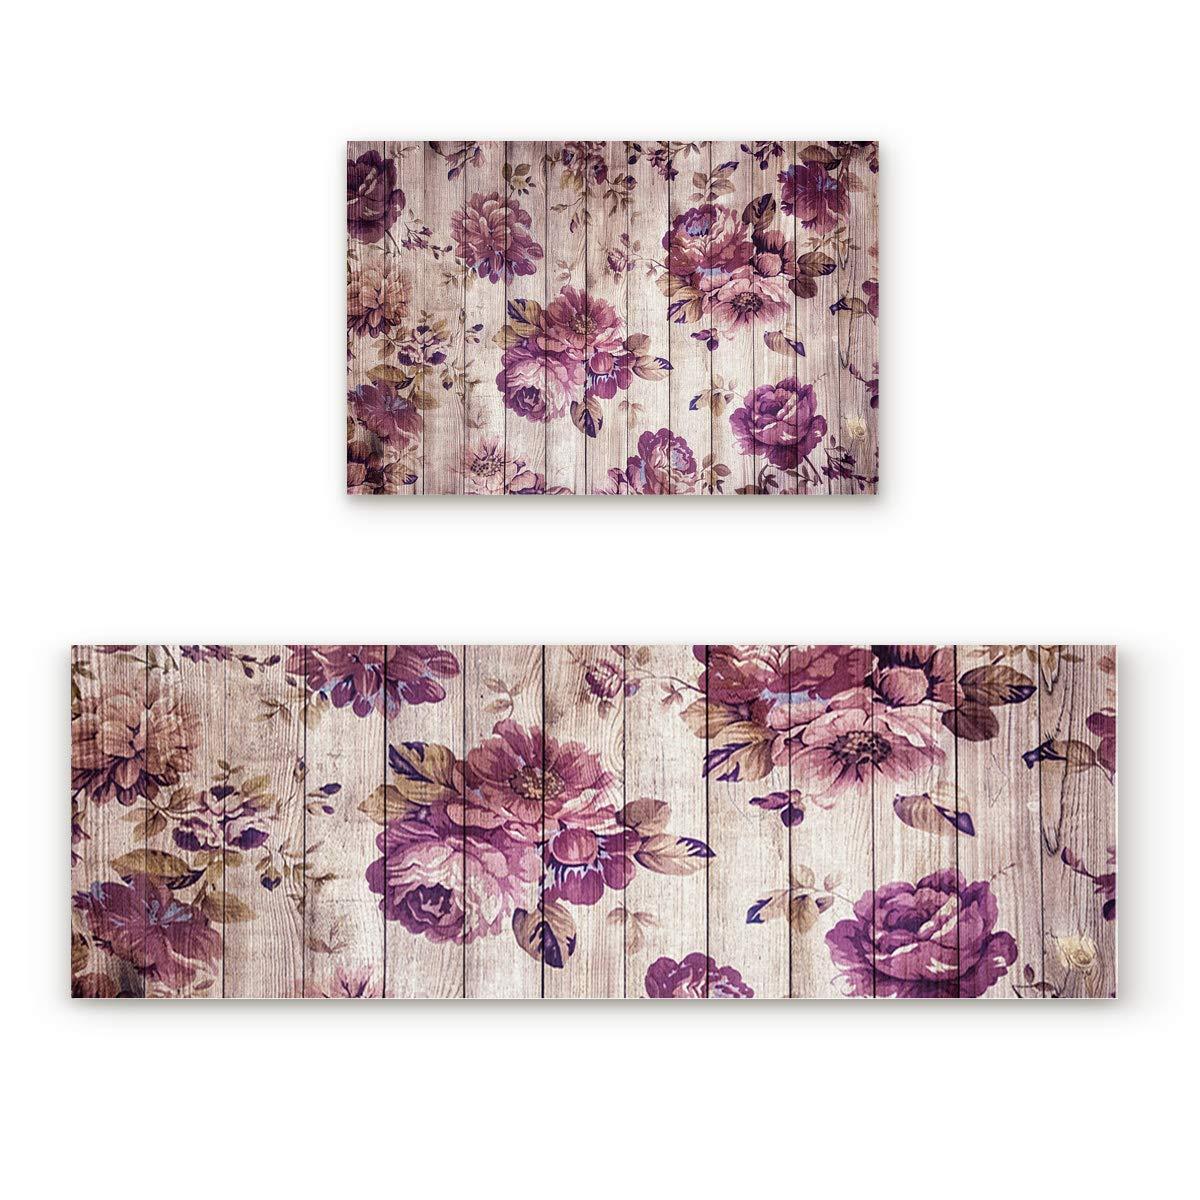 Flower69FIY8519 19.7x31.5In+19.7x47.2In Findamy Non-Slip Indoor Door Mat Entrance Rug Rectangle Absorbent Moisture Floor Carpet for Floral Theme Close-up pink Pattern Doormat 23.6x35.4In+23.6x70.9In